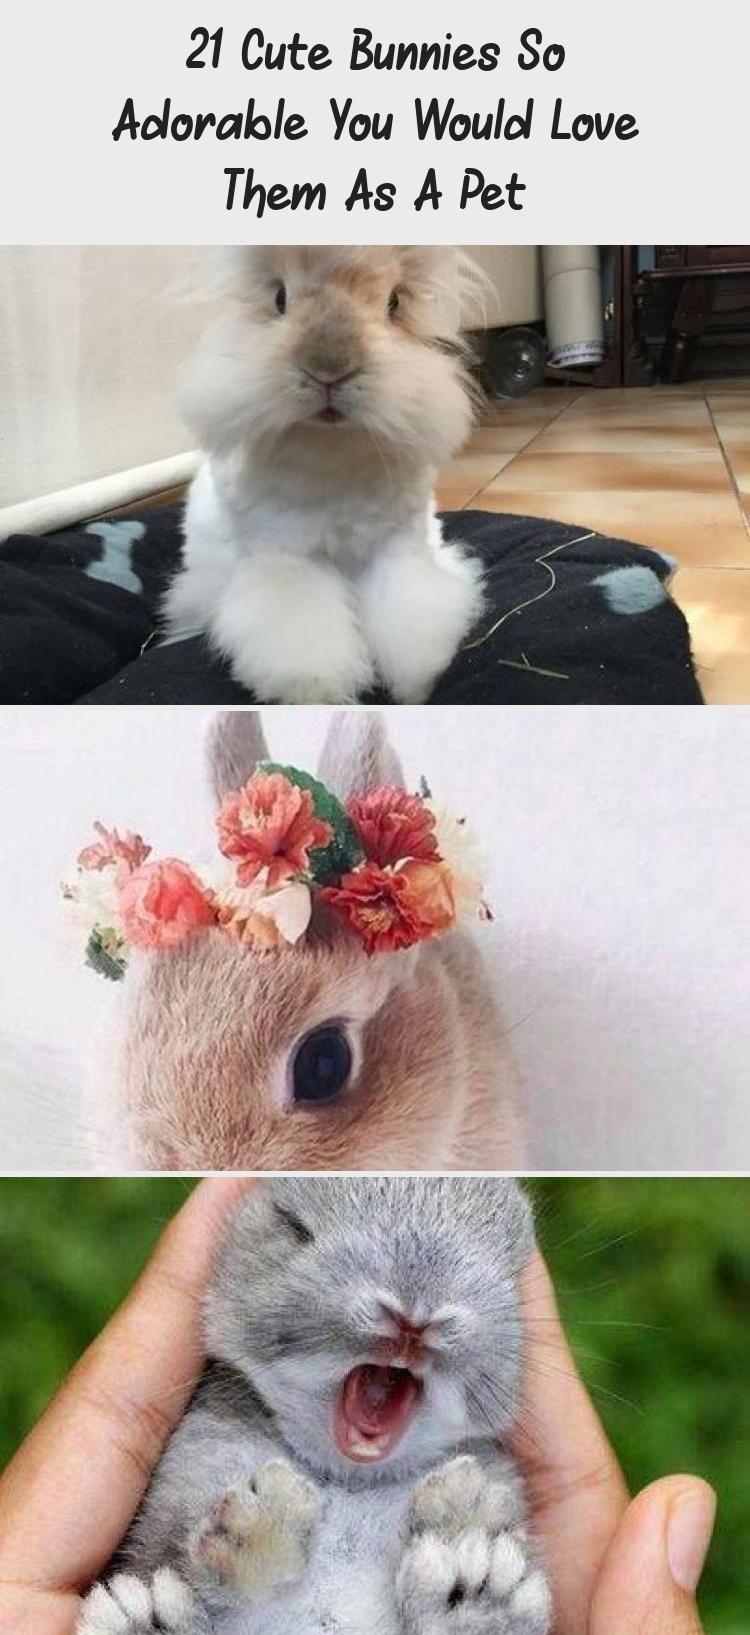 21 Cute Bunnies so Adorable You Would Love them as a Pet - Ritely #AnimalsFunny #AnimalsEnPeligroDeExtincion #AnimalsMemes #AnimalsDomesticos #AnimalsYouDidn'tKnowExisted